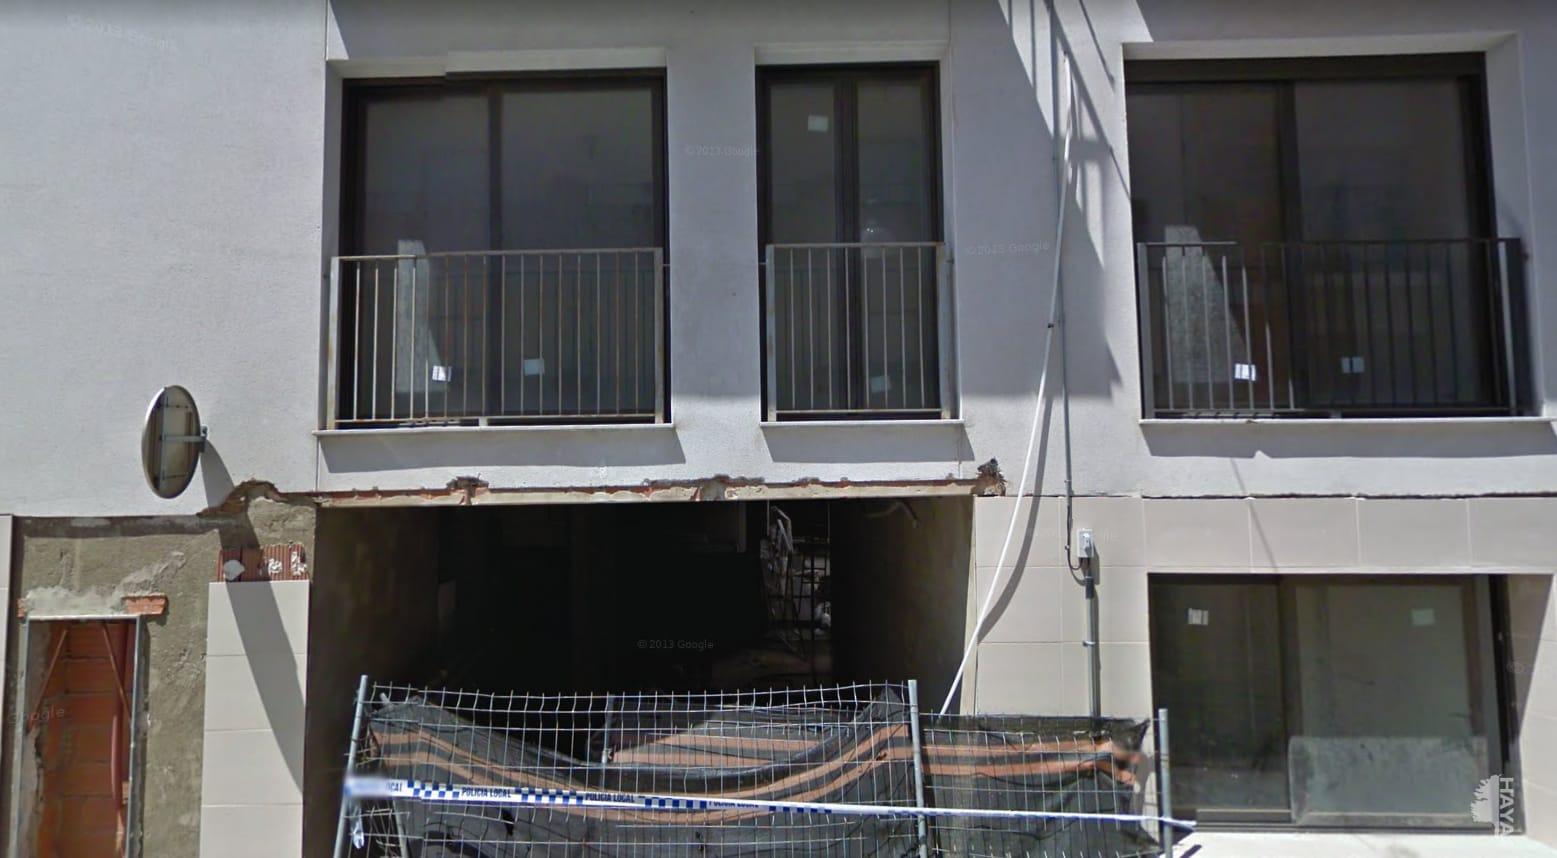 Piso en venta en Palafolls, Barcelona, Calle Mar, 59.400 €, 1 habitación, 1 baño, 48 m2